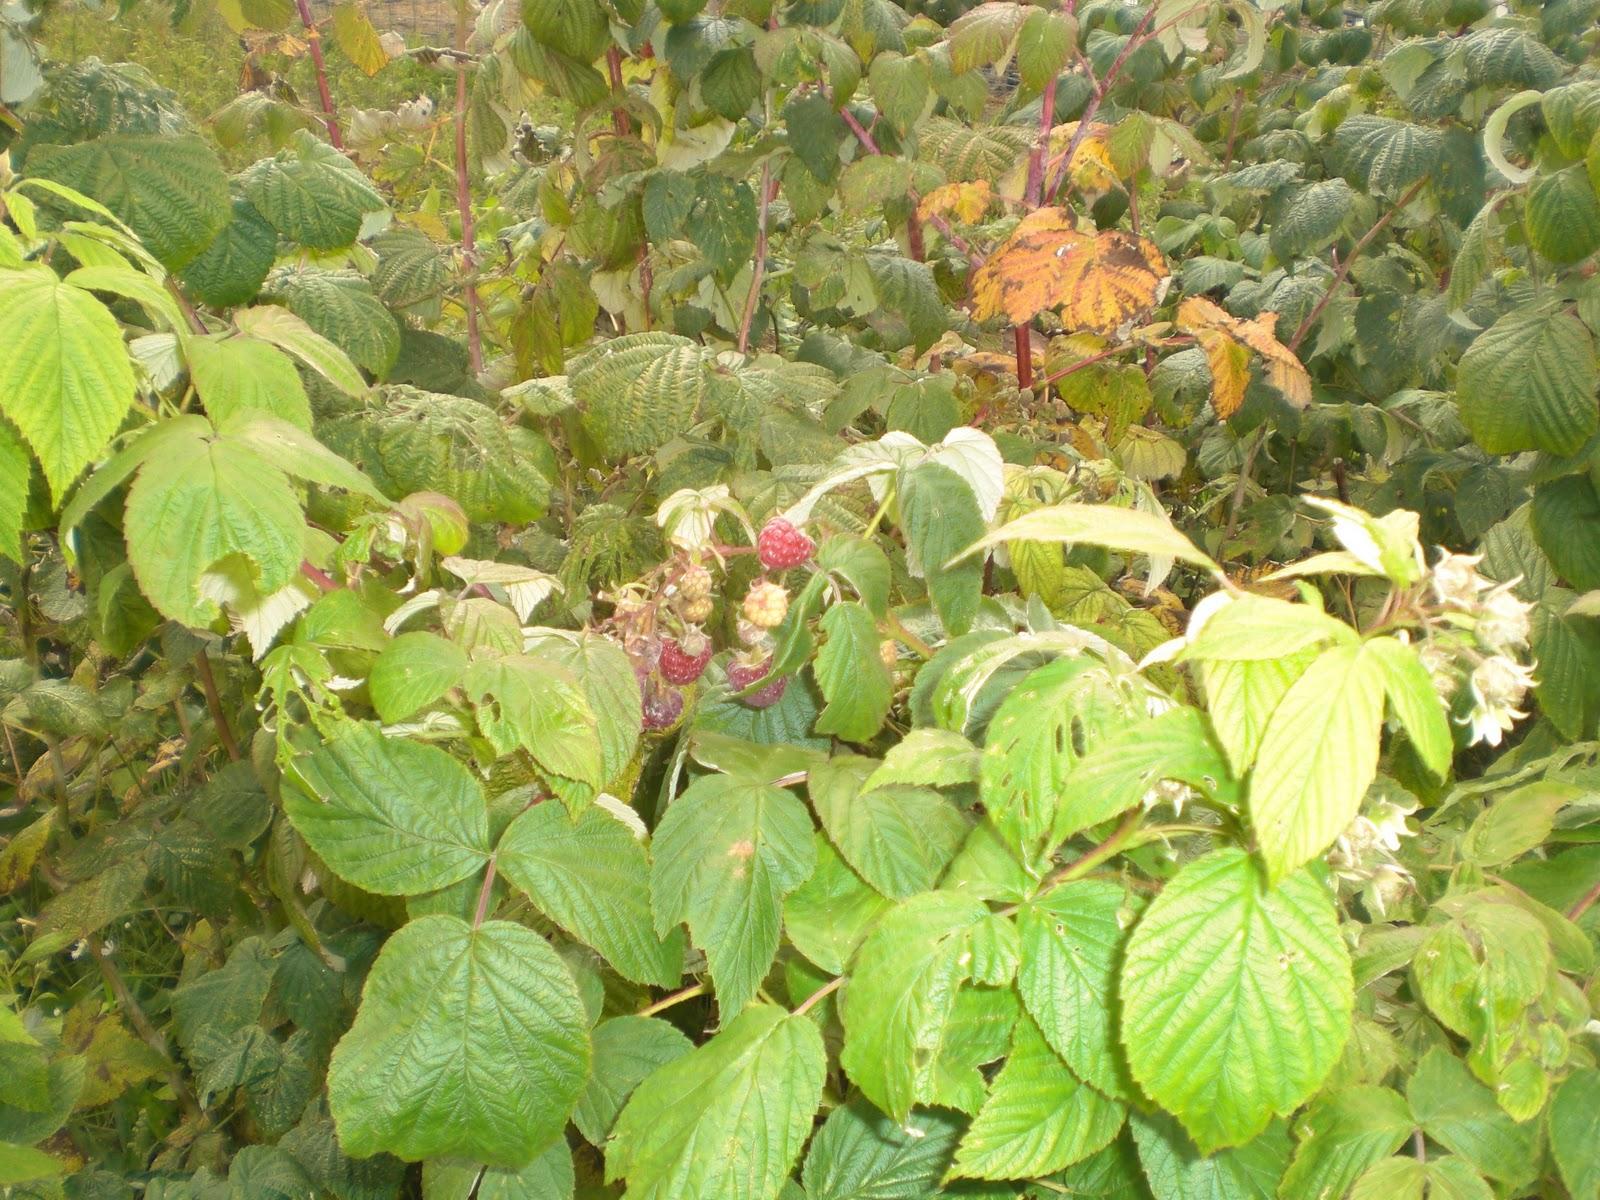 Raspberry Farming